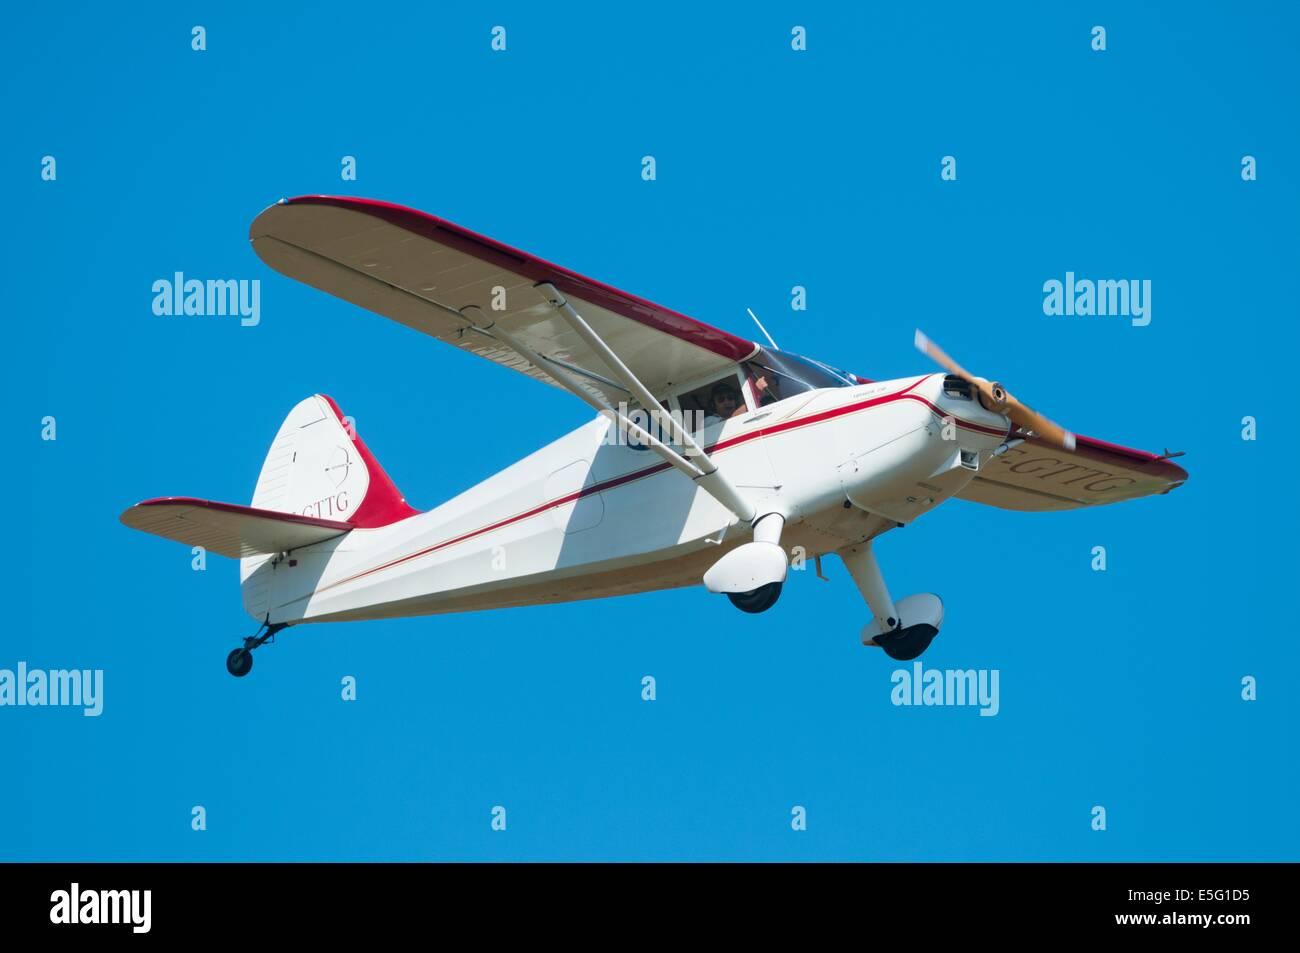 Stinson 108-1 Voyager, old 40's plane, France - Stock Image